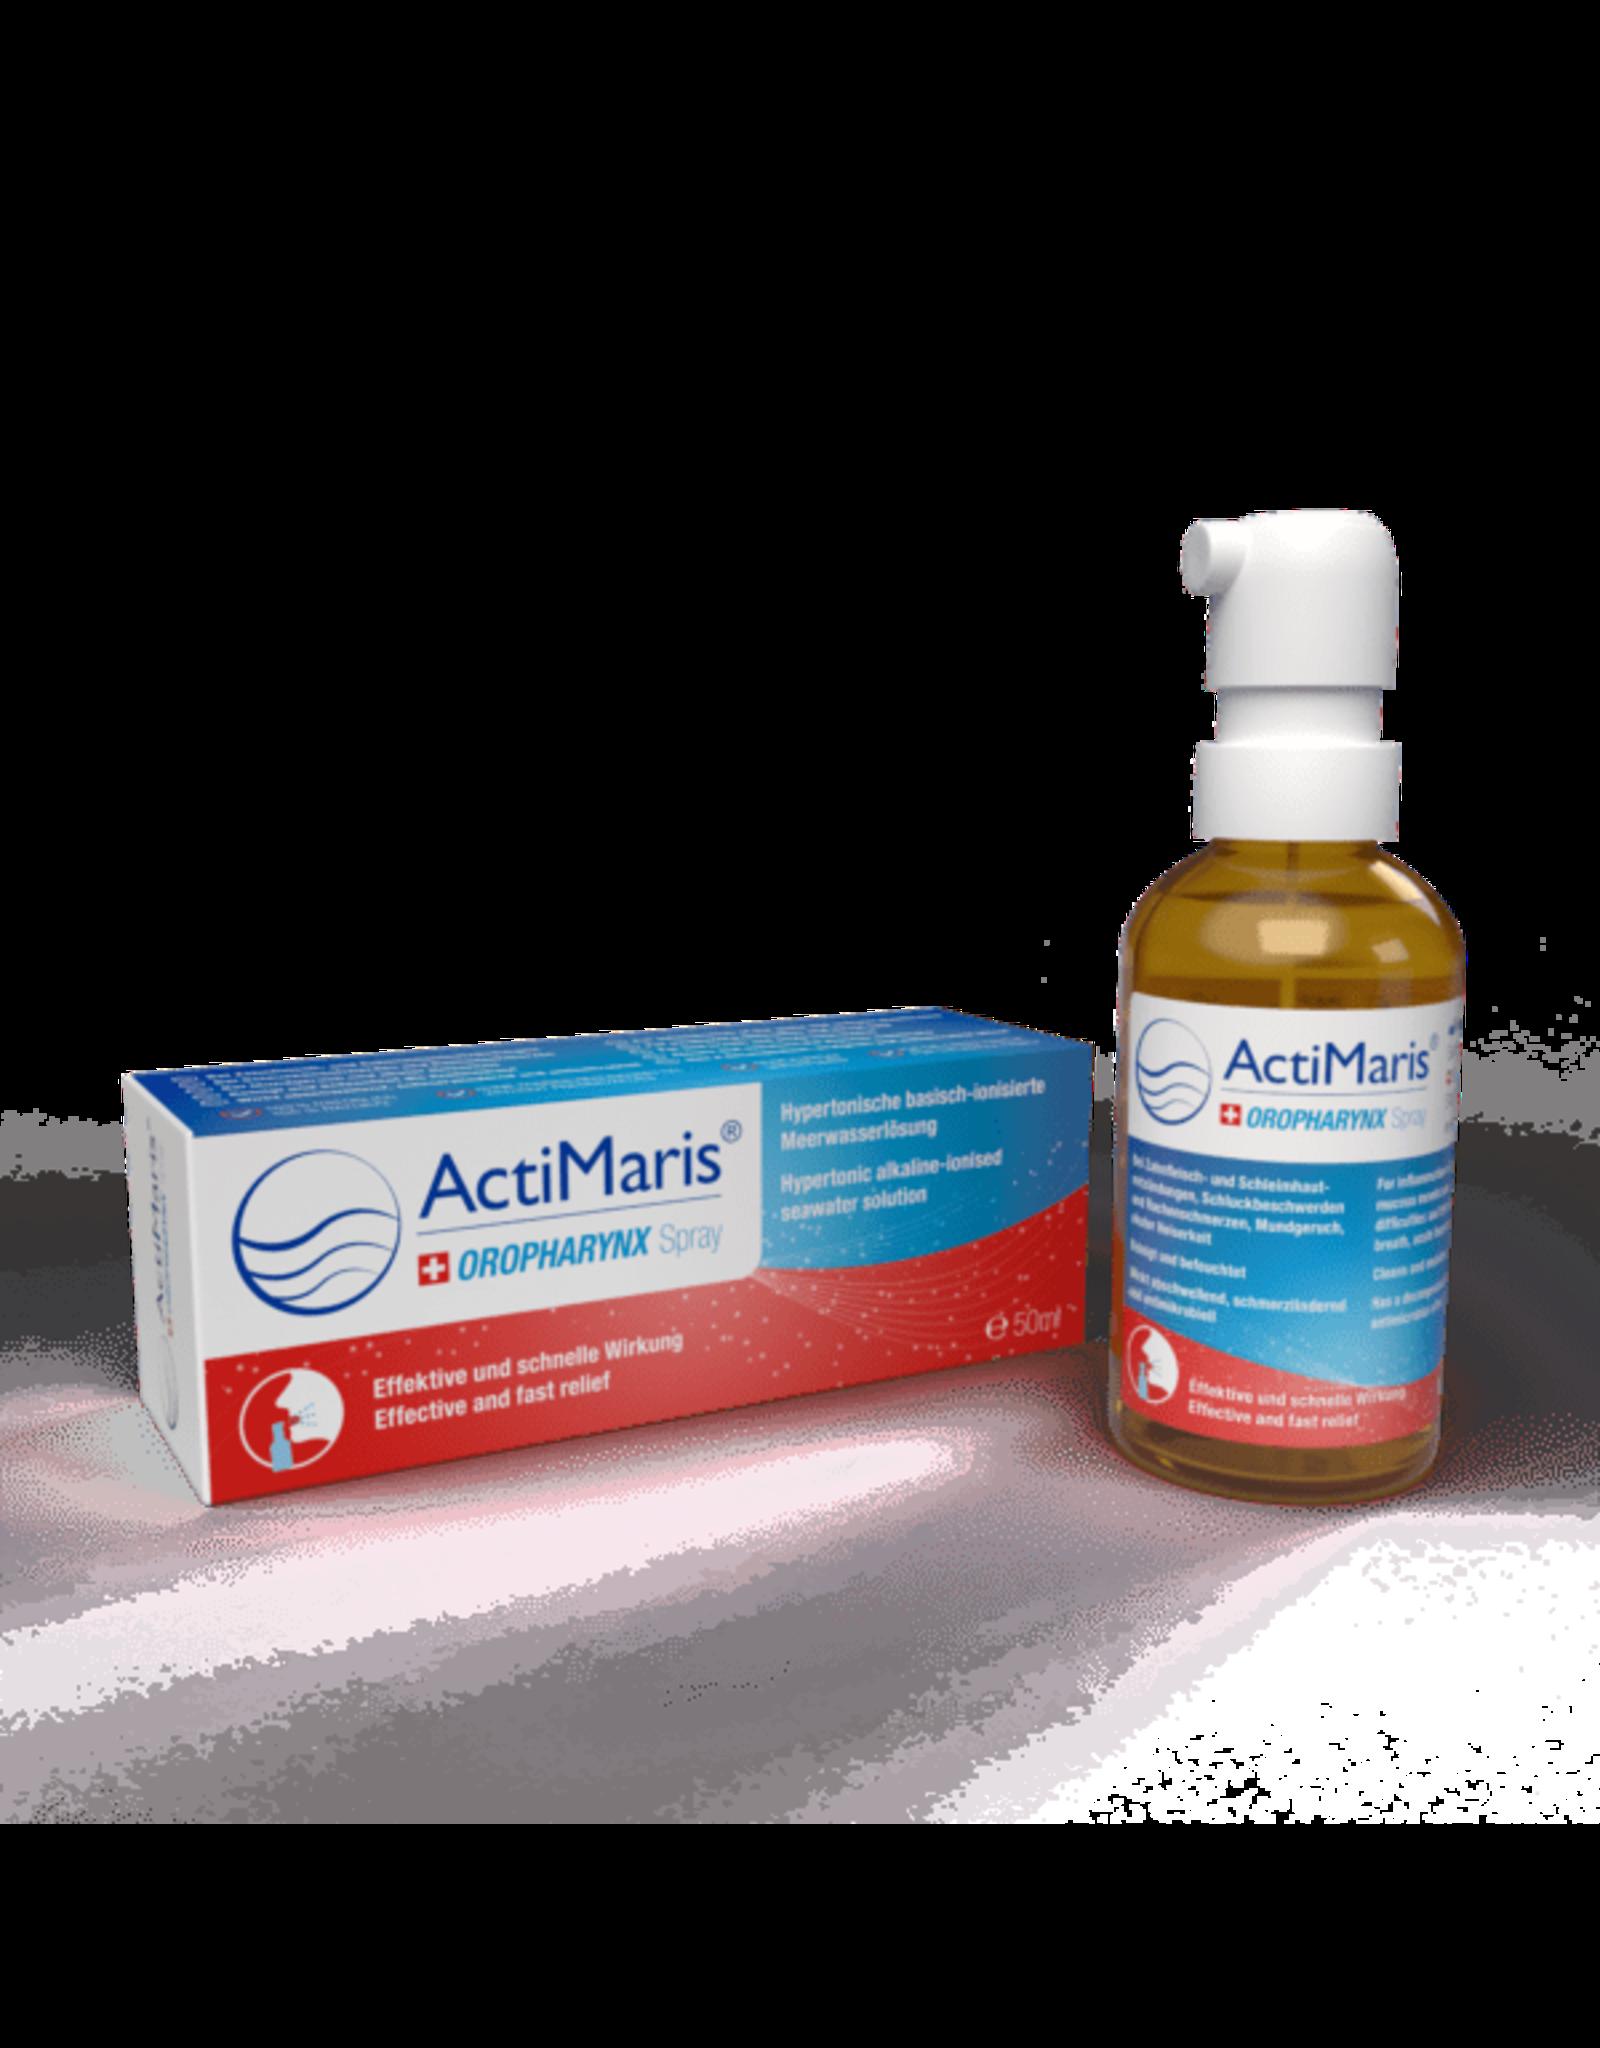 ActiMaris ActiMaris® OROPHARYNX spray